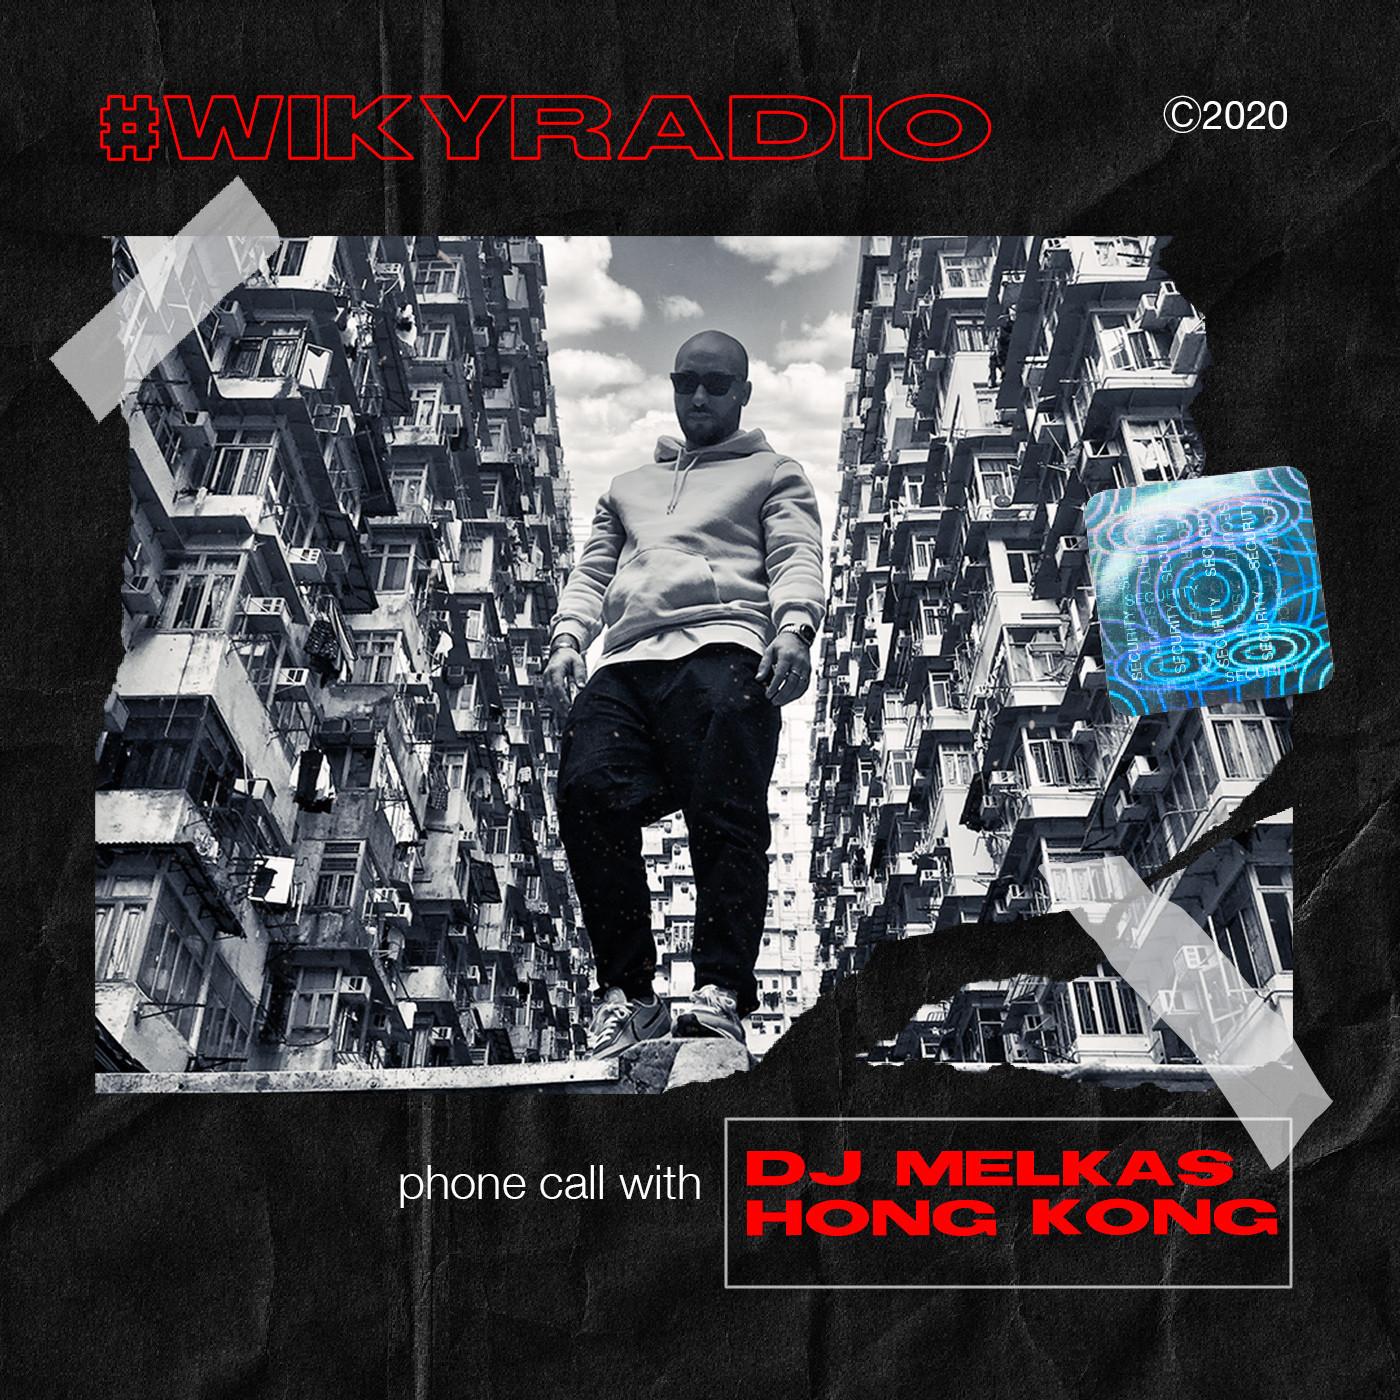 WIKY RADIO - PHONE CALL WITH DJ MELKAS (HONG KONG)